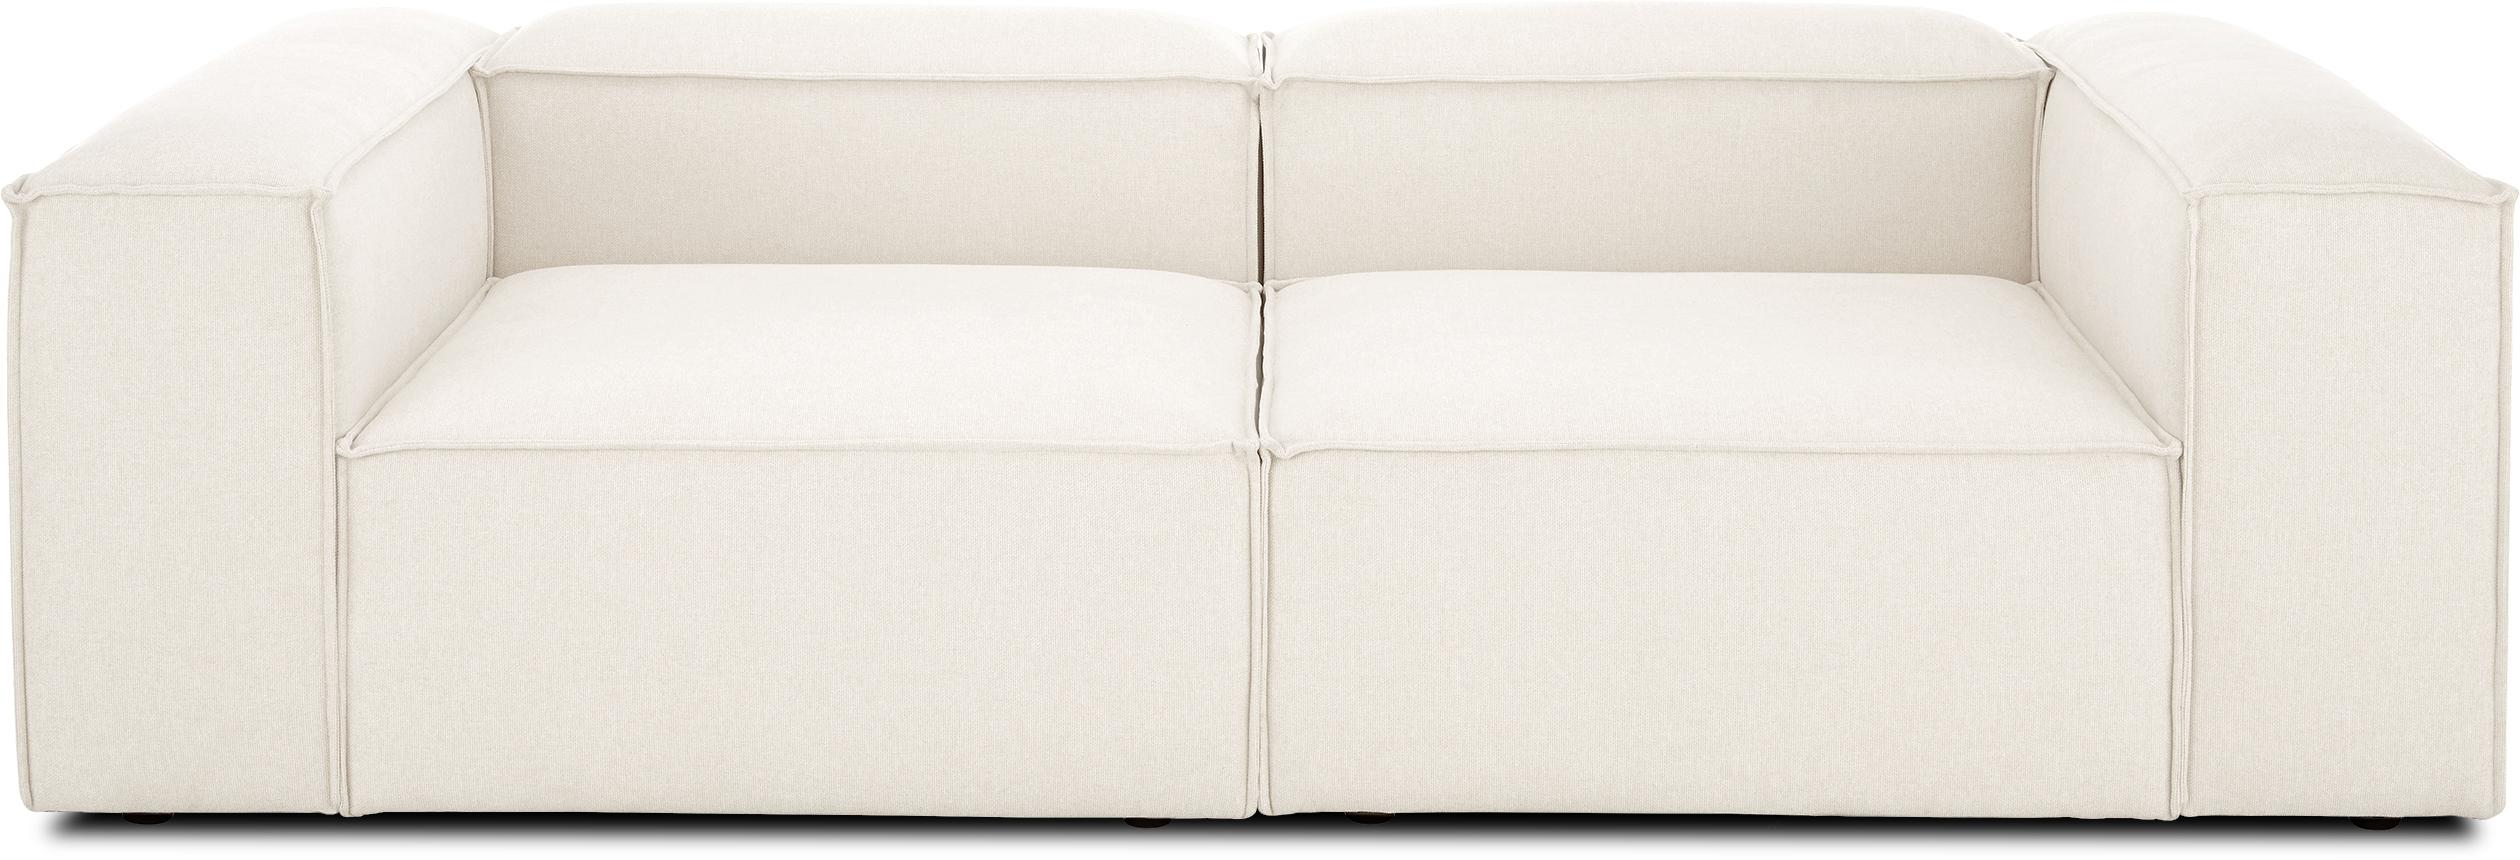 Modulares Sofa Lennon (3-Sitzer), Bezug: Polyester Der hochwertige, Gestell: Massives Kiefernholz, Spe, Füße: Kunststoff, Webstoff Beige, B 238 x T 119 cm